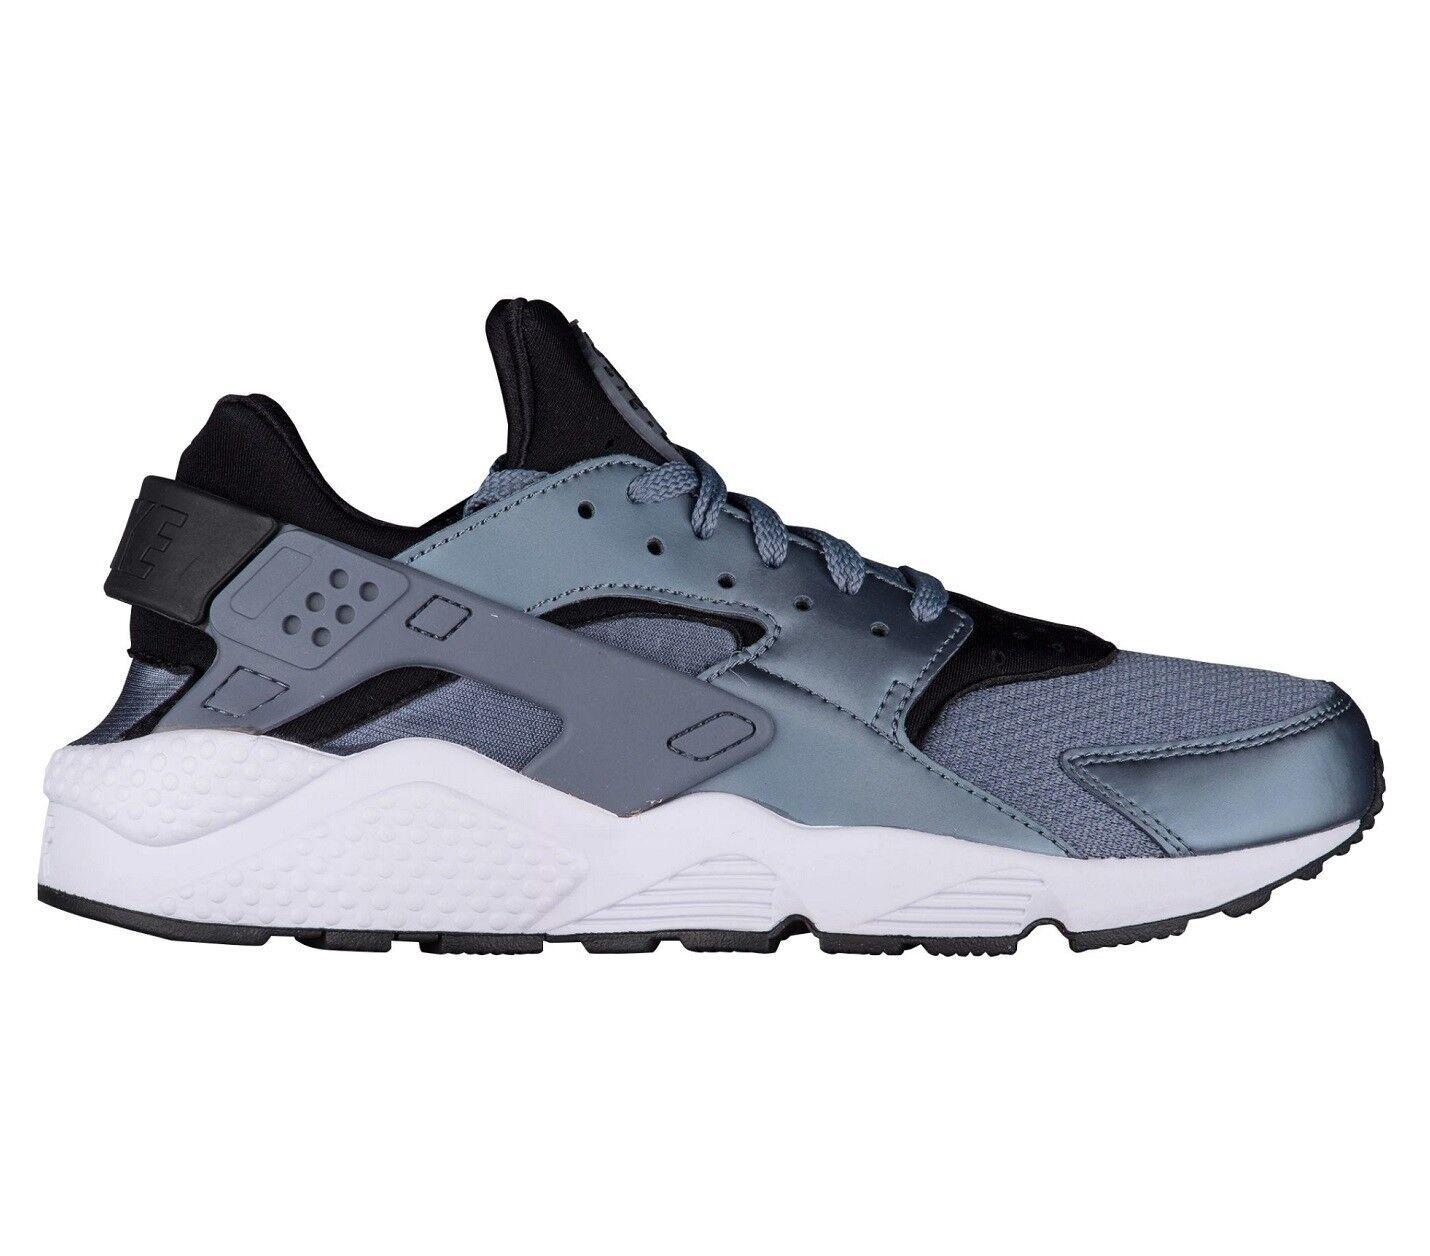 Nike Air Huarache Mens 318429-419 Armory Blue Black Running Shoes Size 8